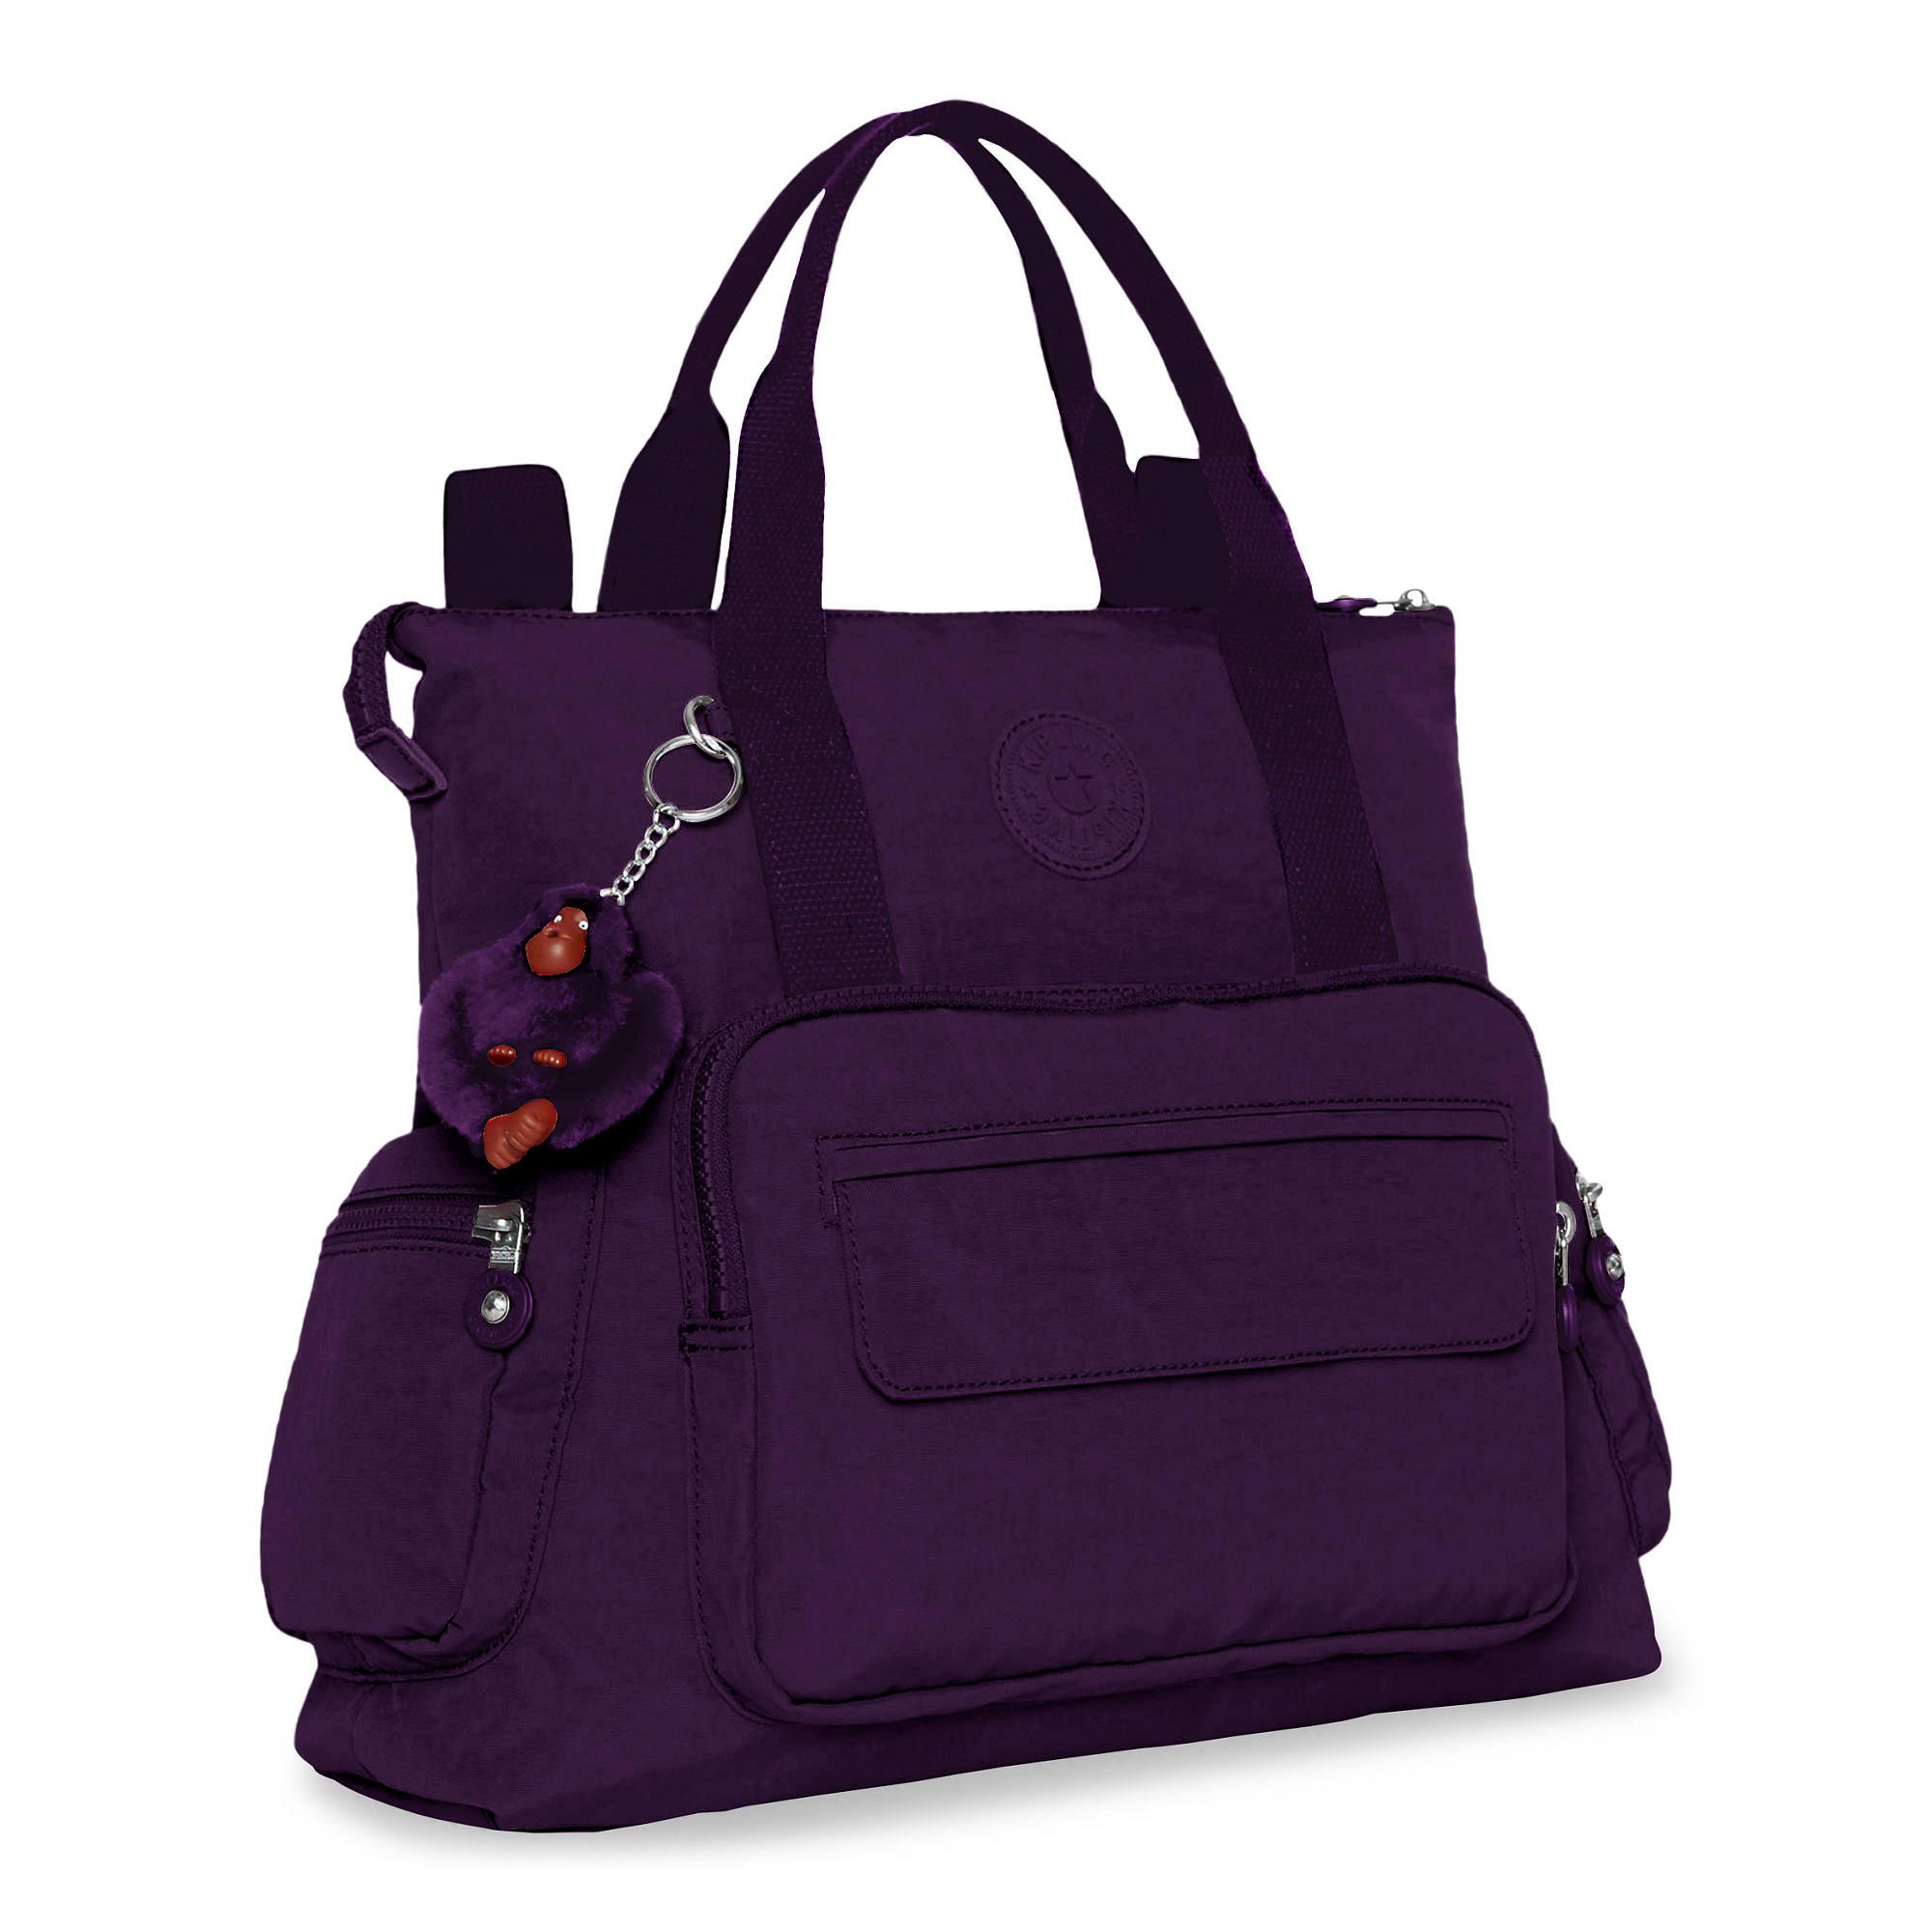 Kipling-Alvy-2-In-1-Convertible-Tote-Bag-Backpack miniatura 17